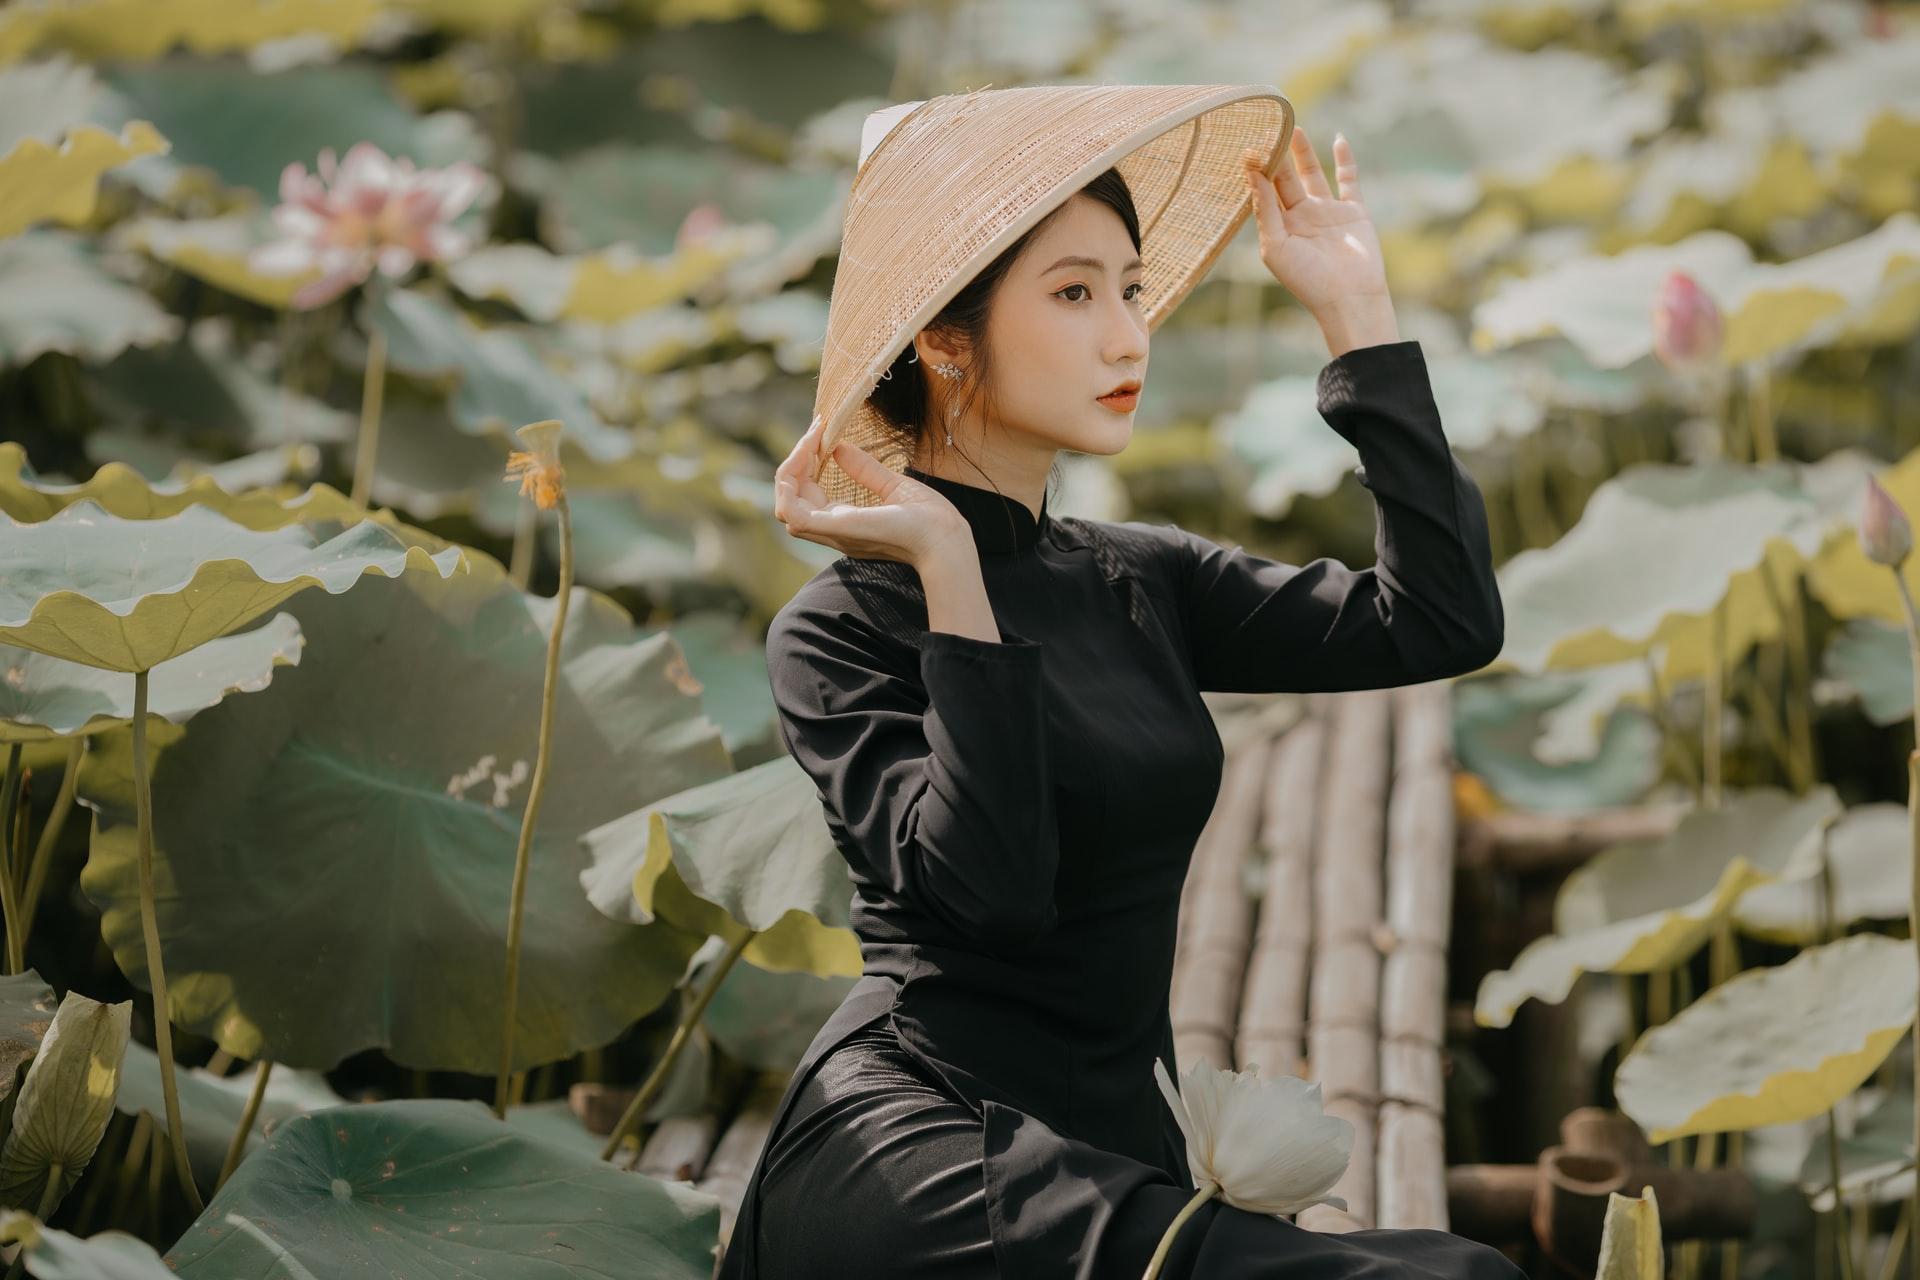 Vietnamese mail order bride cost